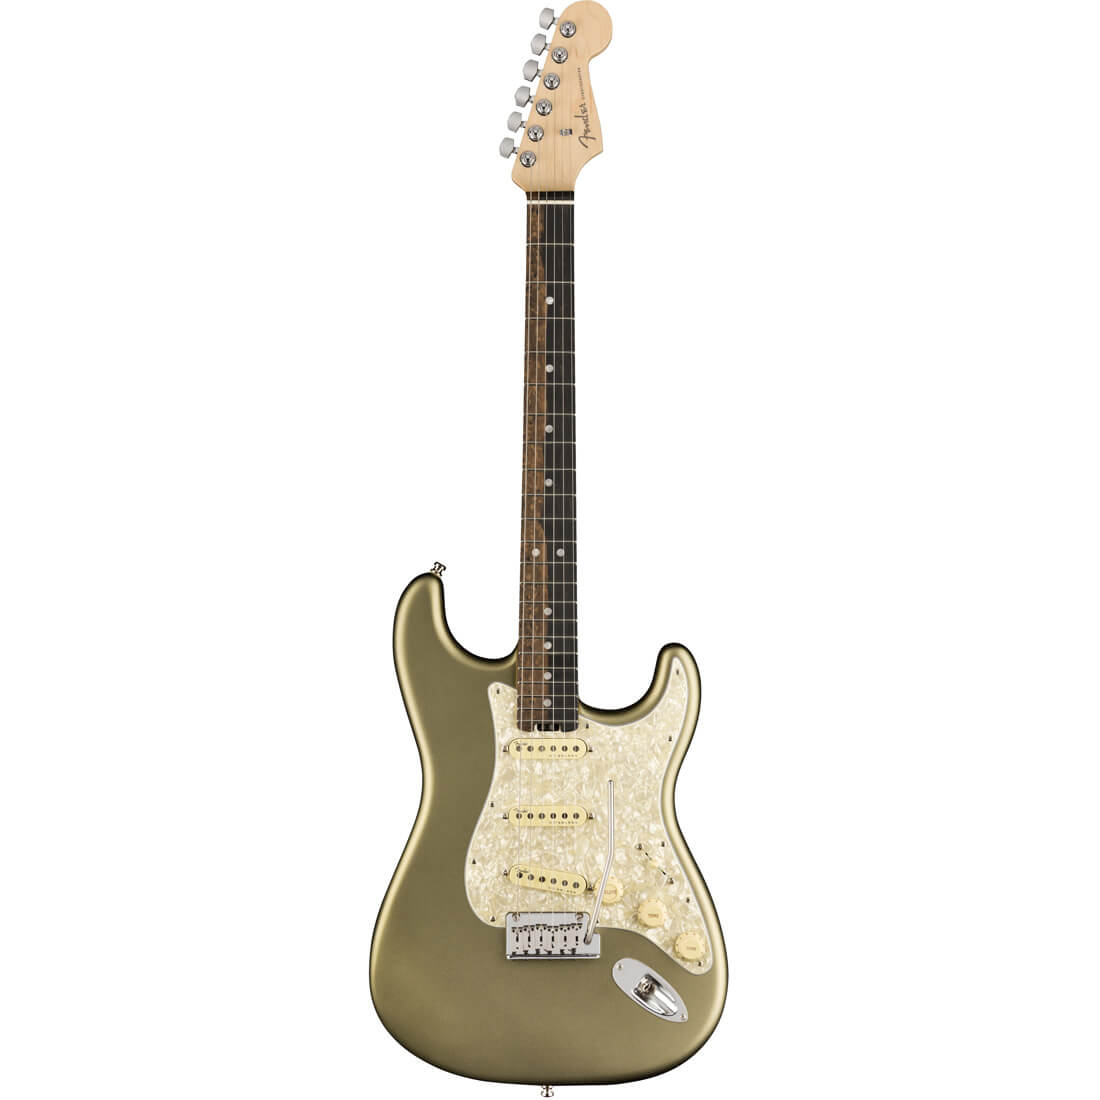 Image of   Fender American Elite Stratocaster, EB, Satin JPM el-guitar satin jade pearl metallic